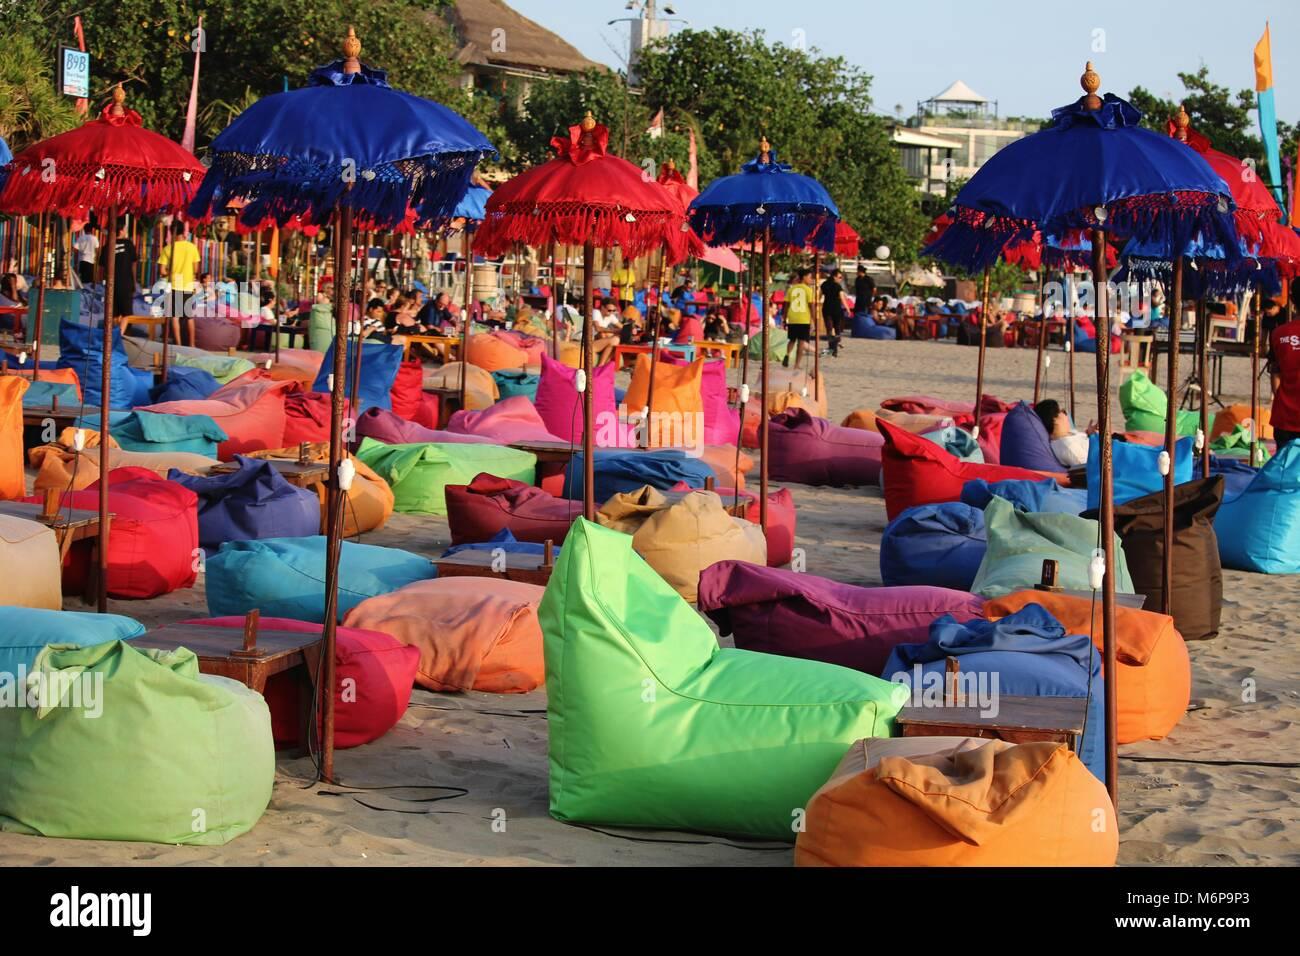 Bali, Indonesia - November 12, 2015: A colorful beach bar in Canggu Beach north of Seminyak - Stock Image